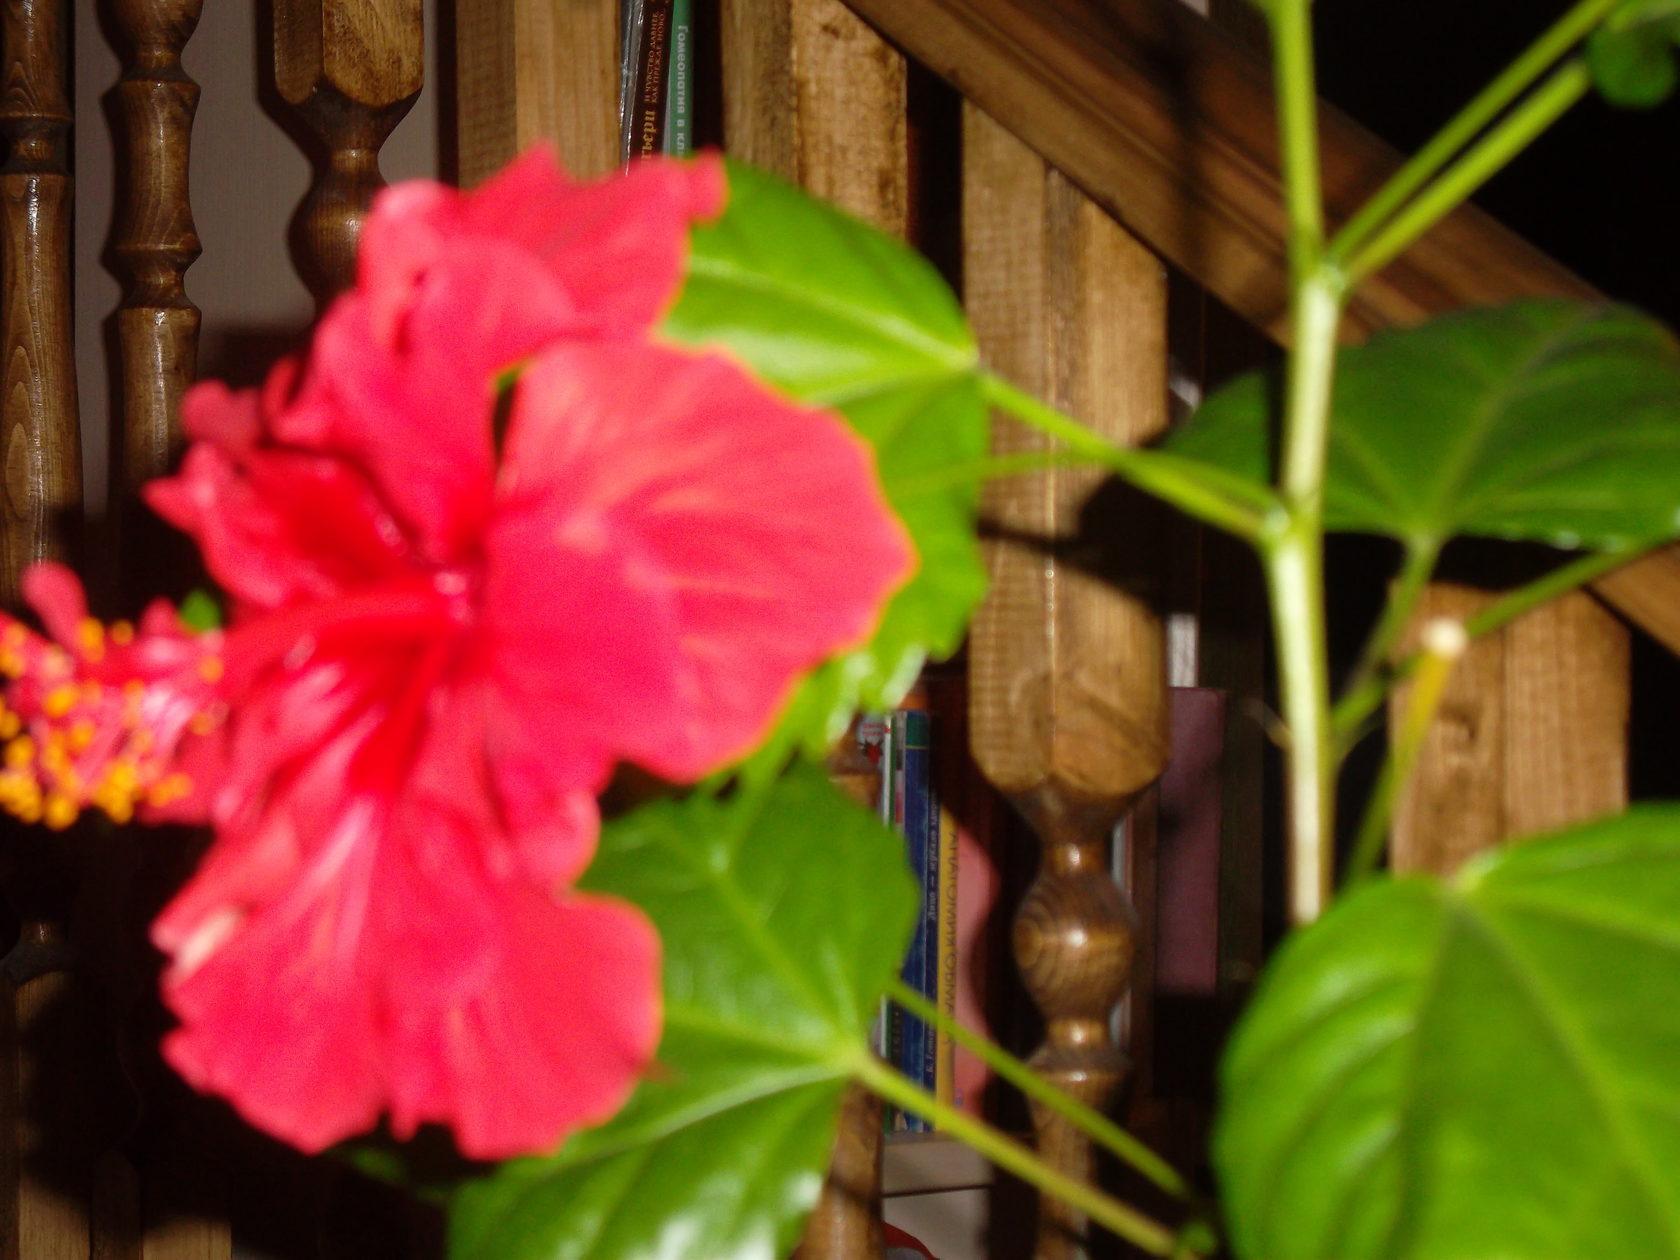 Результат замачивания семян цветов в 0.02% растворе кислоты фото - отчет